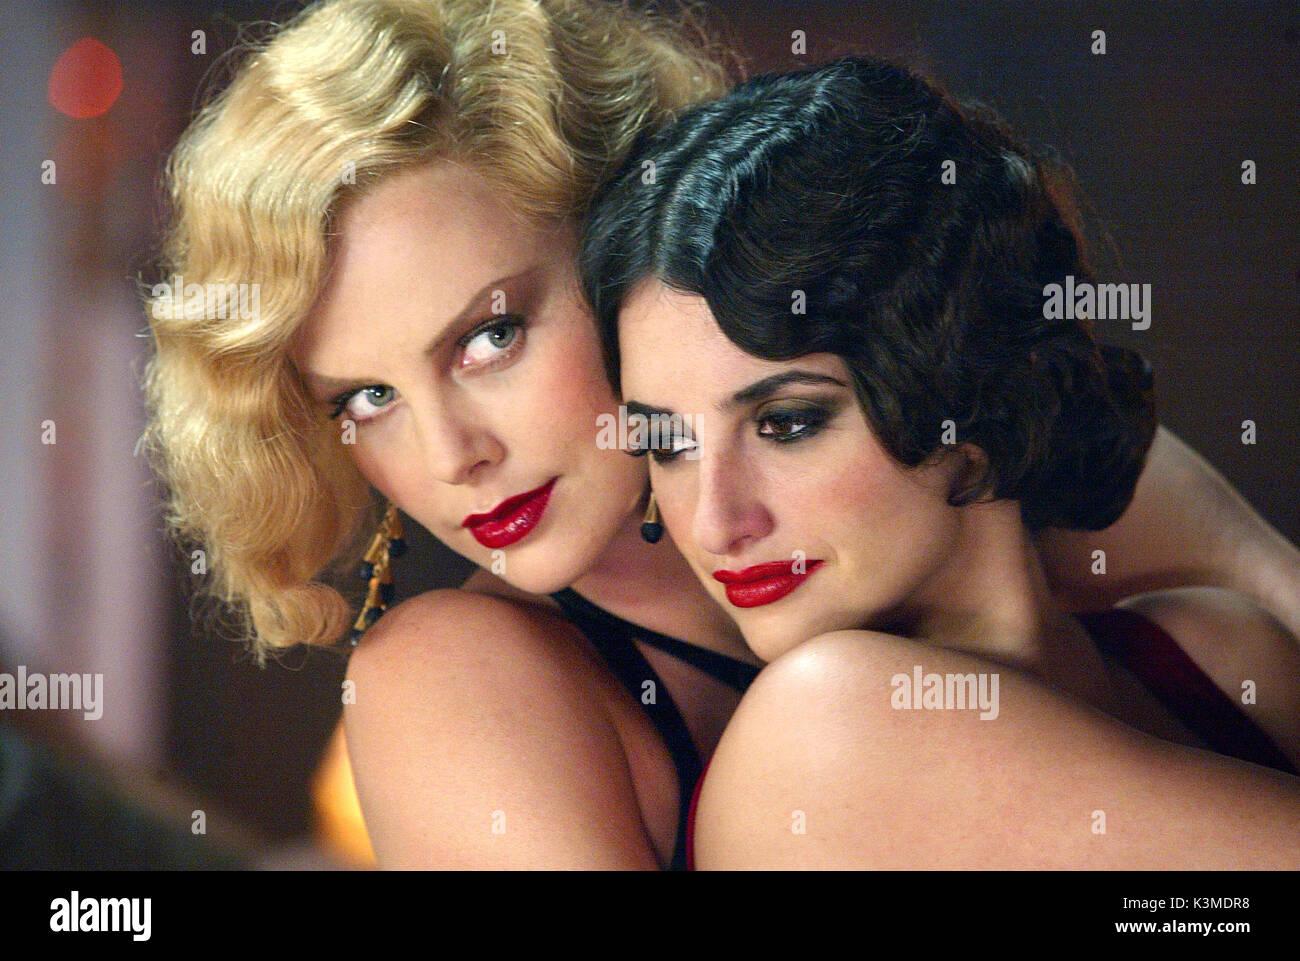 Hot lesbian twin